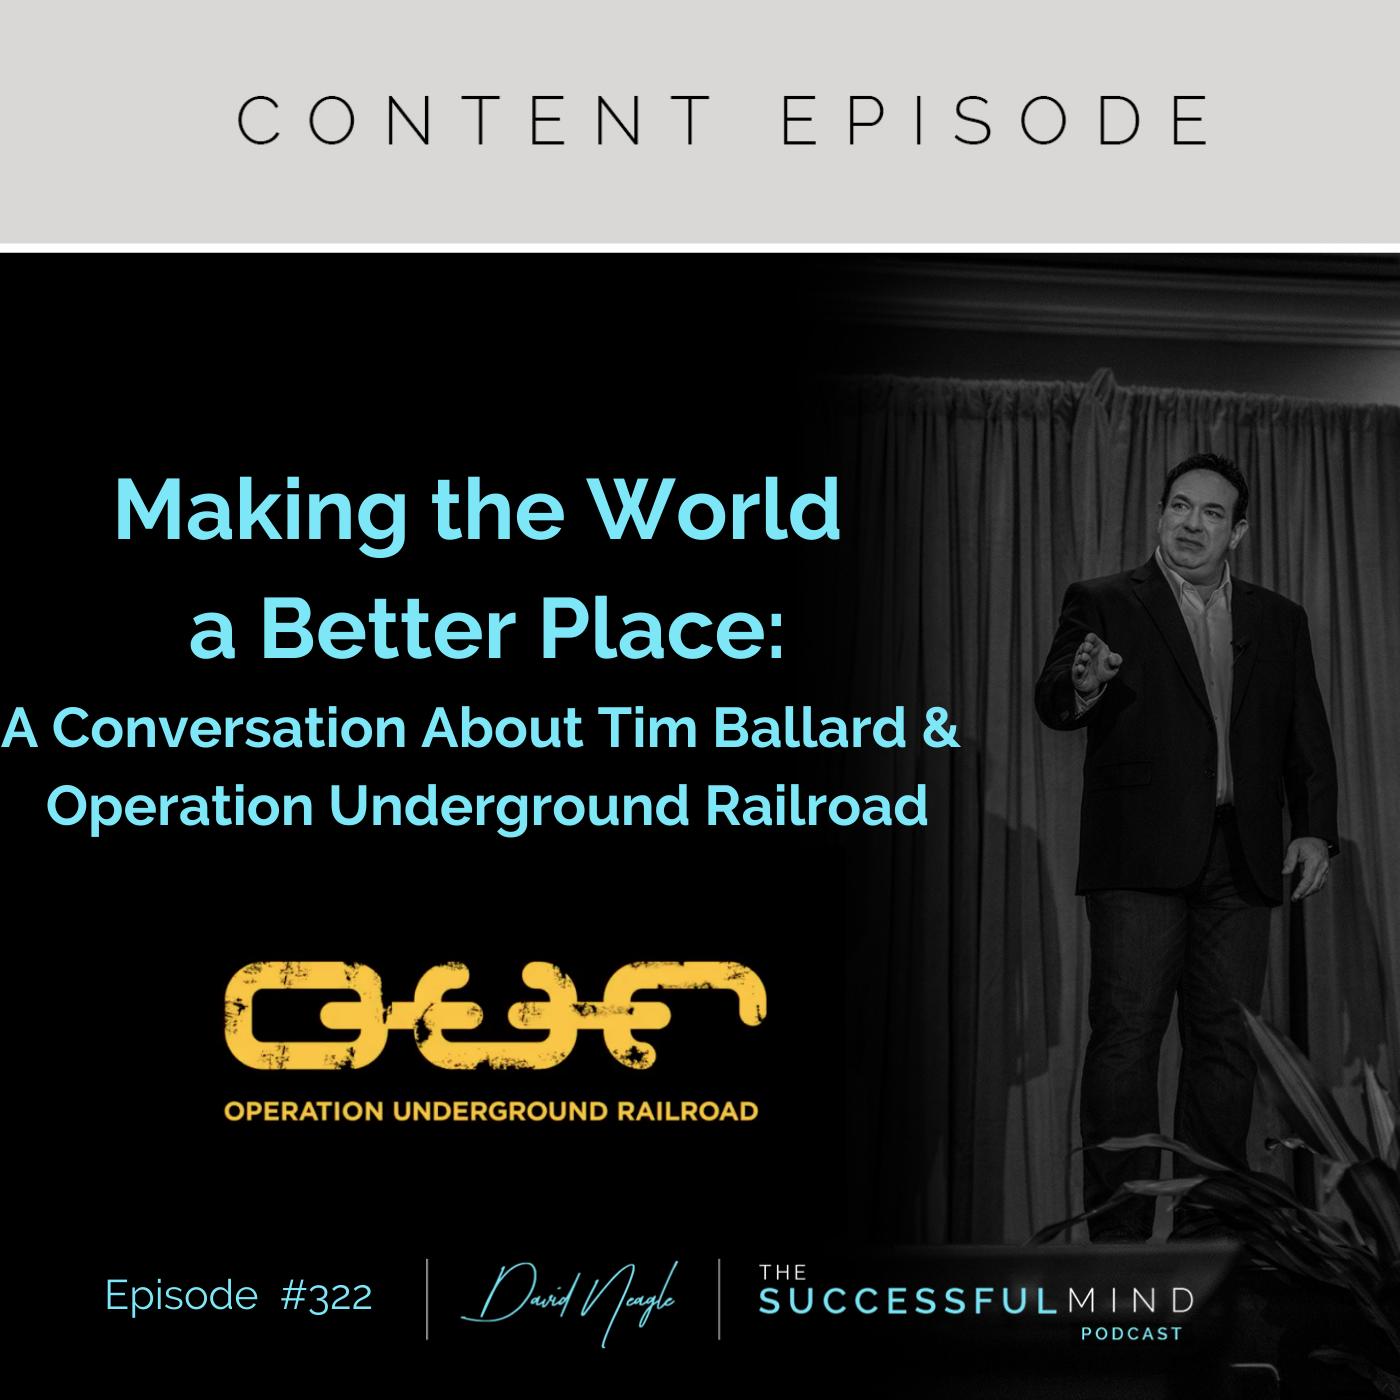 The Successful Mind Podcast – Episode 322 – Making the World a Better Place:  Tim Ballard & Operation Underground Railroad